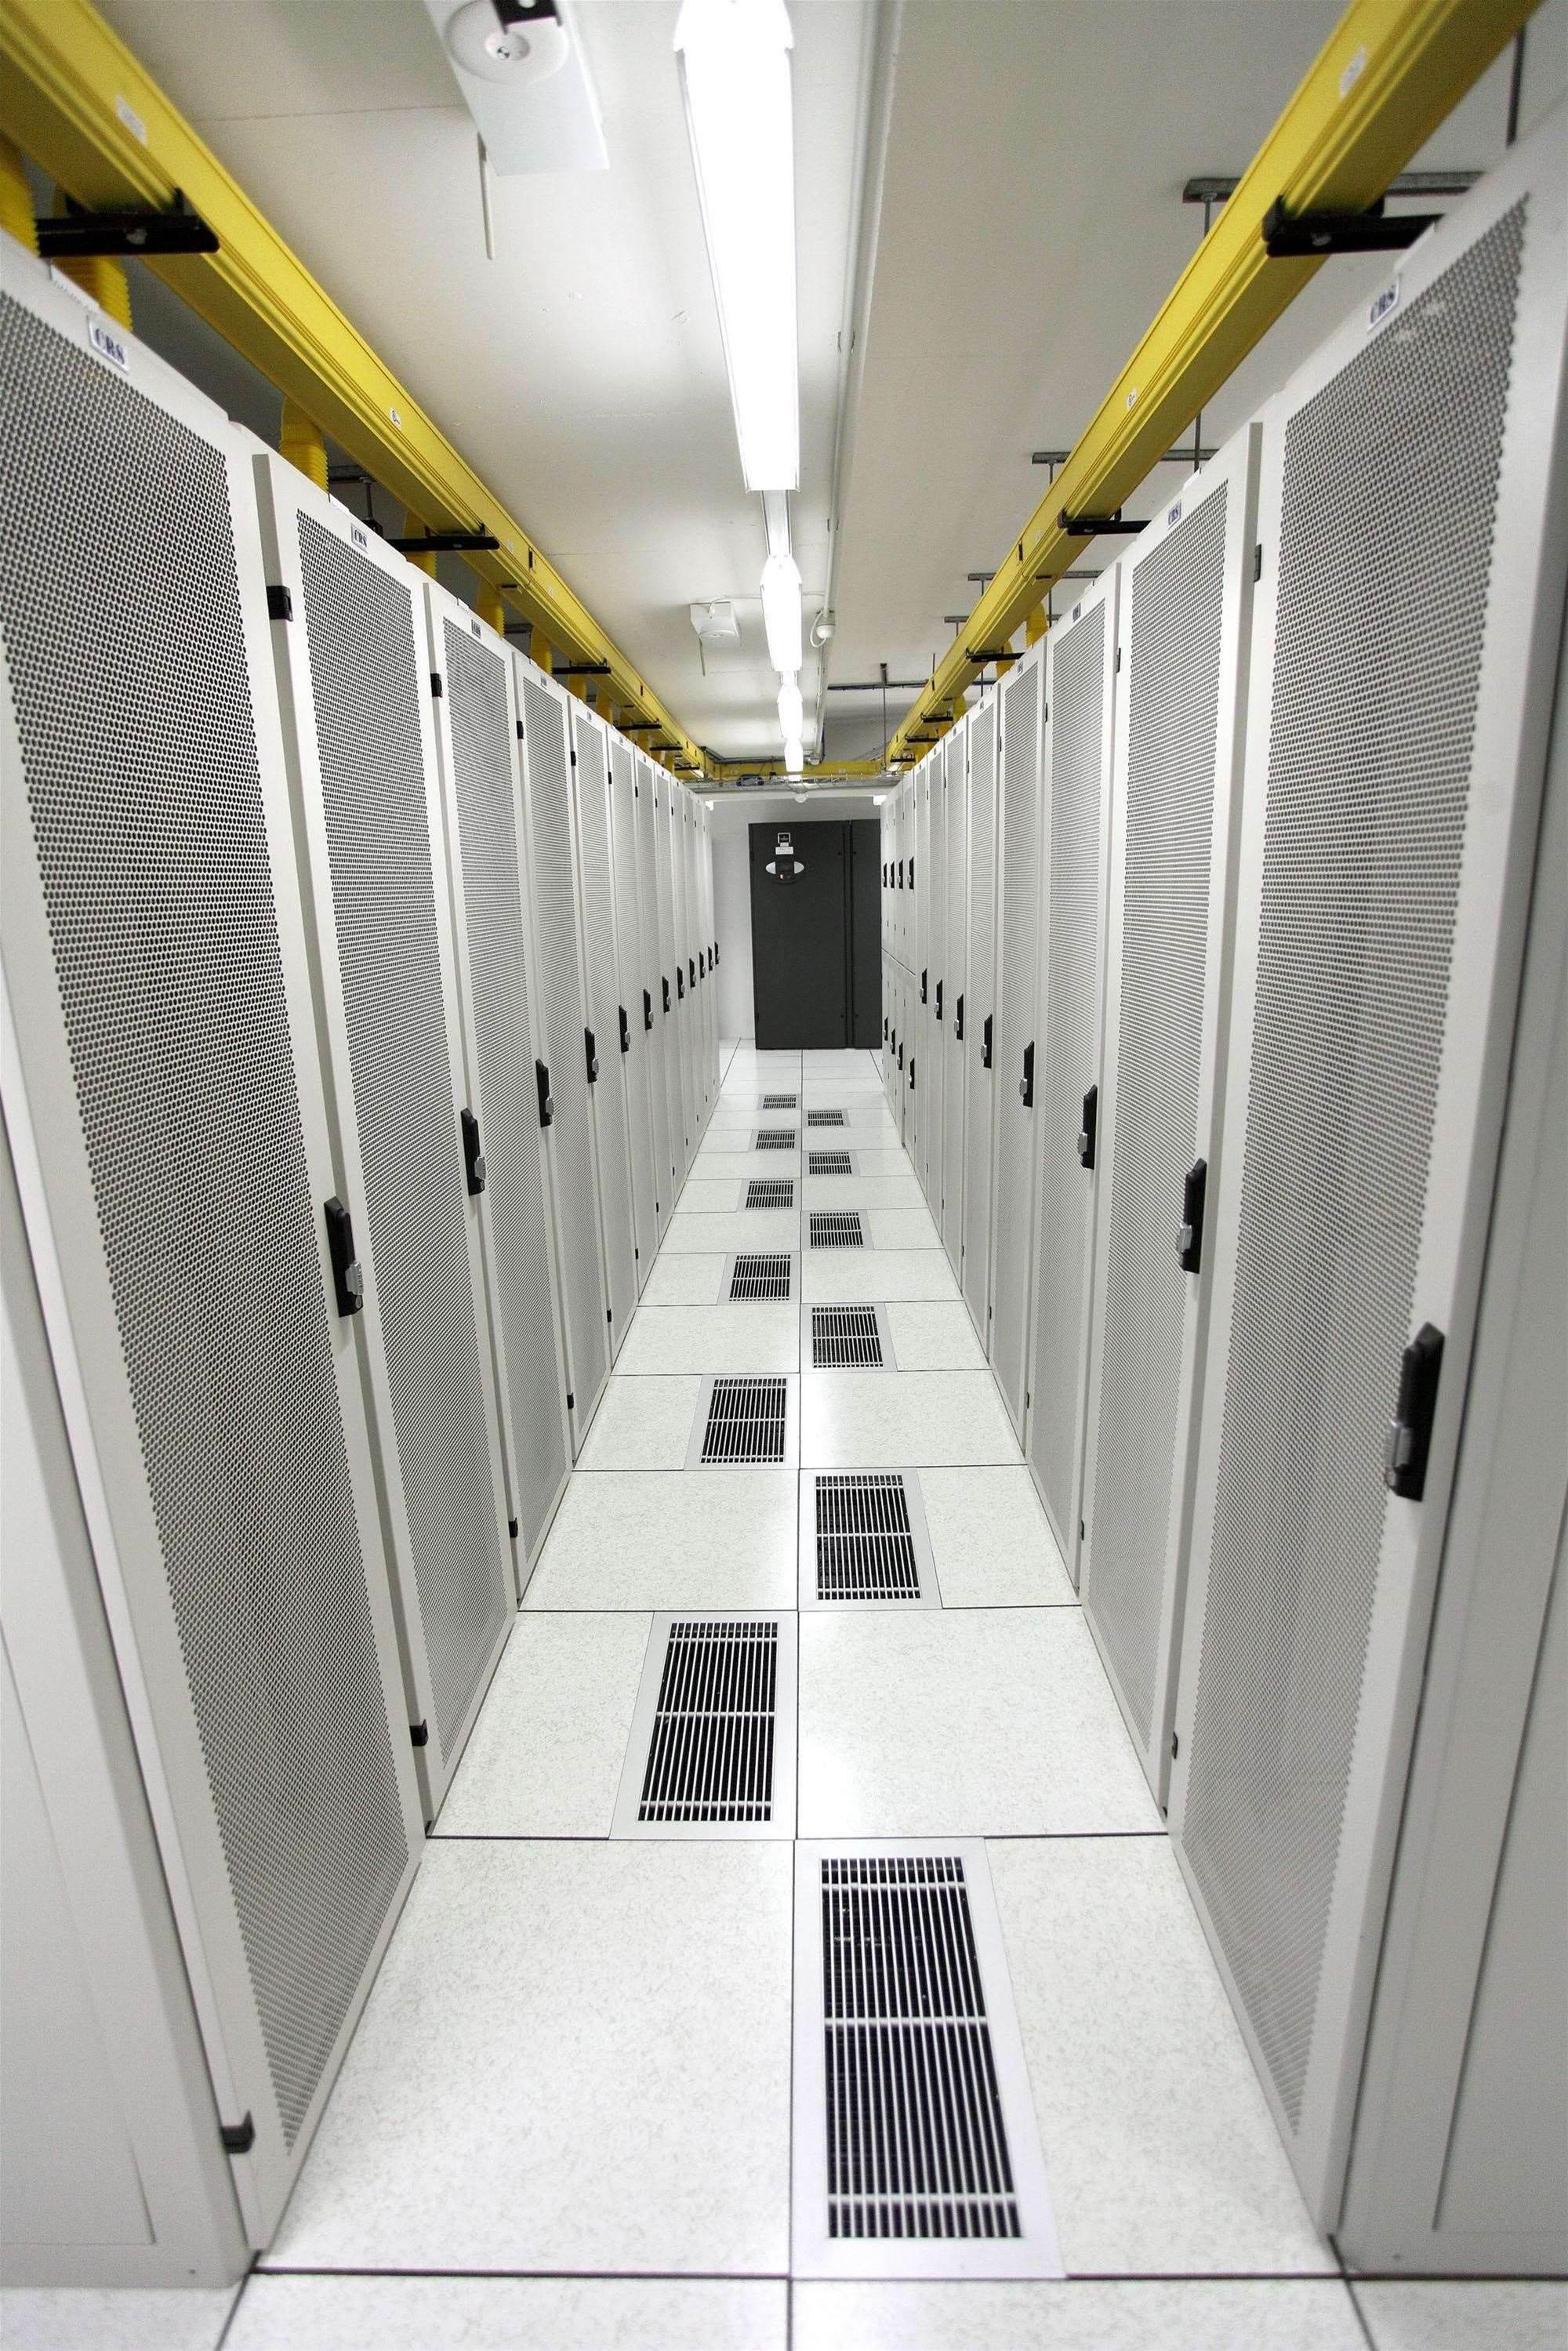 Pacnet triples Sydney data centre capacity